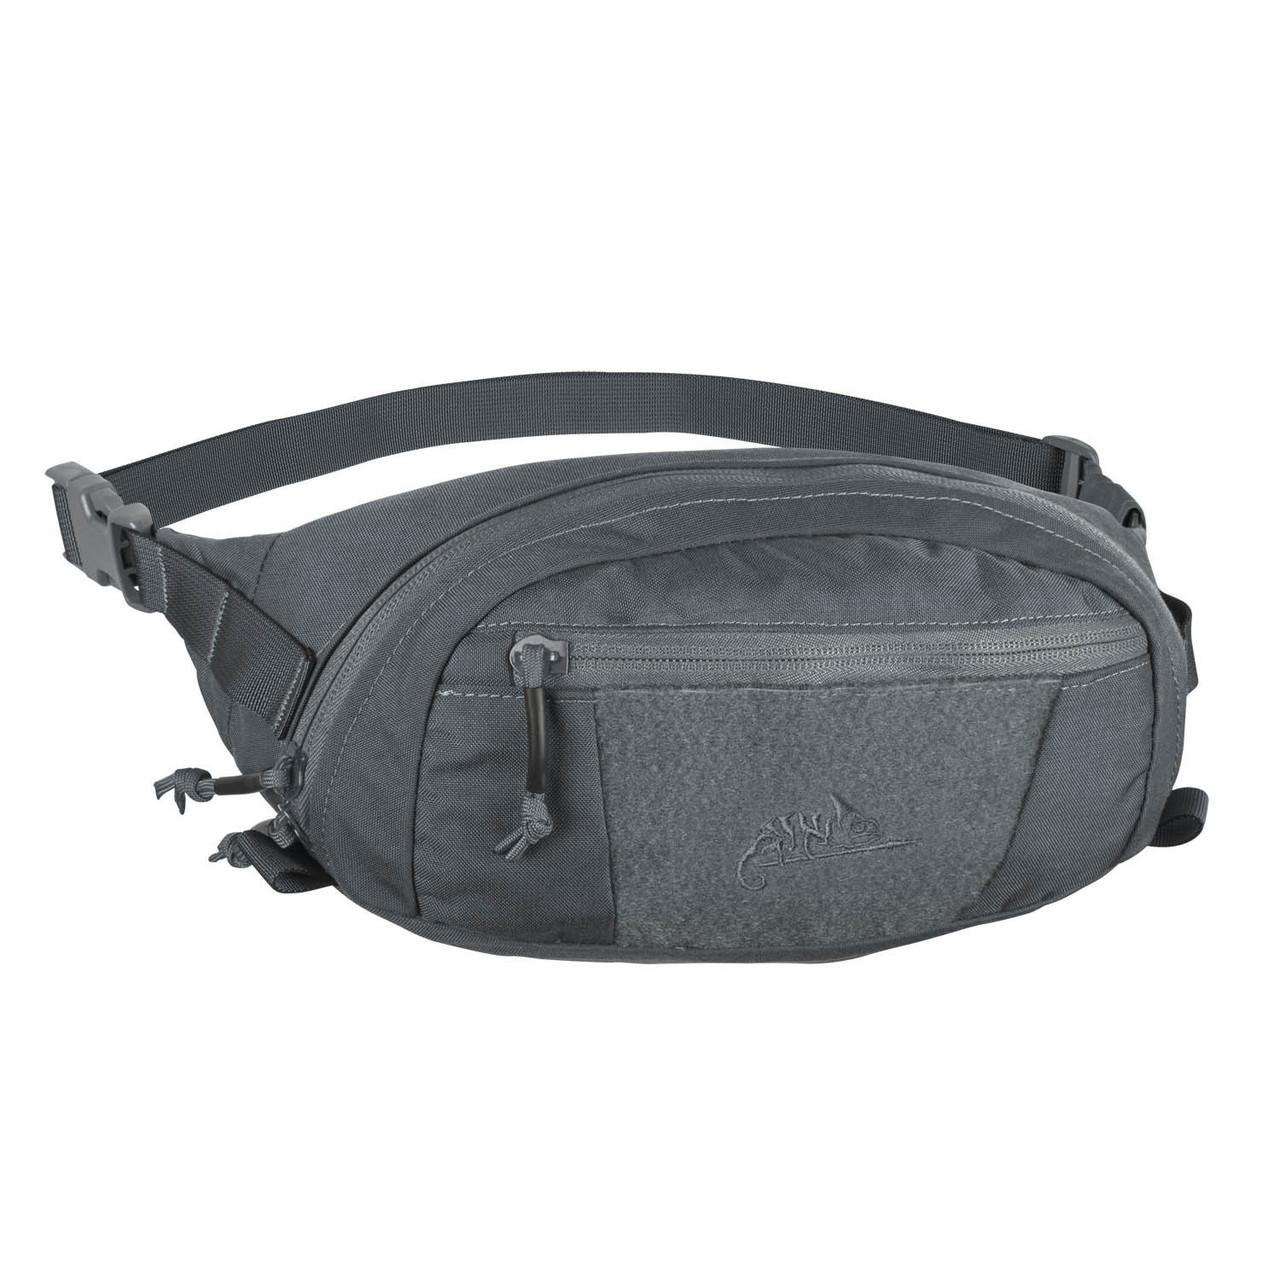 Сумка поясная Helikon-Tex® BANDICOOT® Waist Pack - Cordura® - Темно-серая